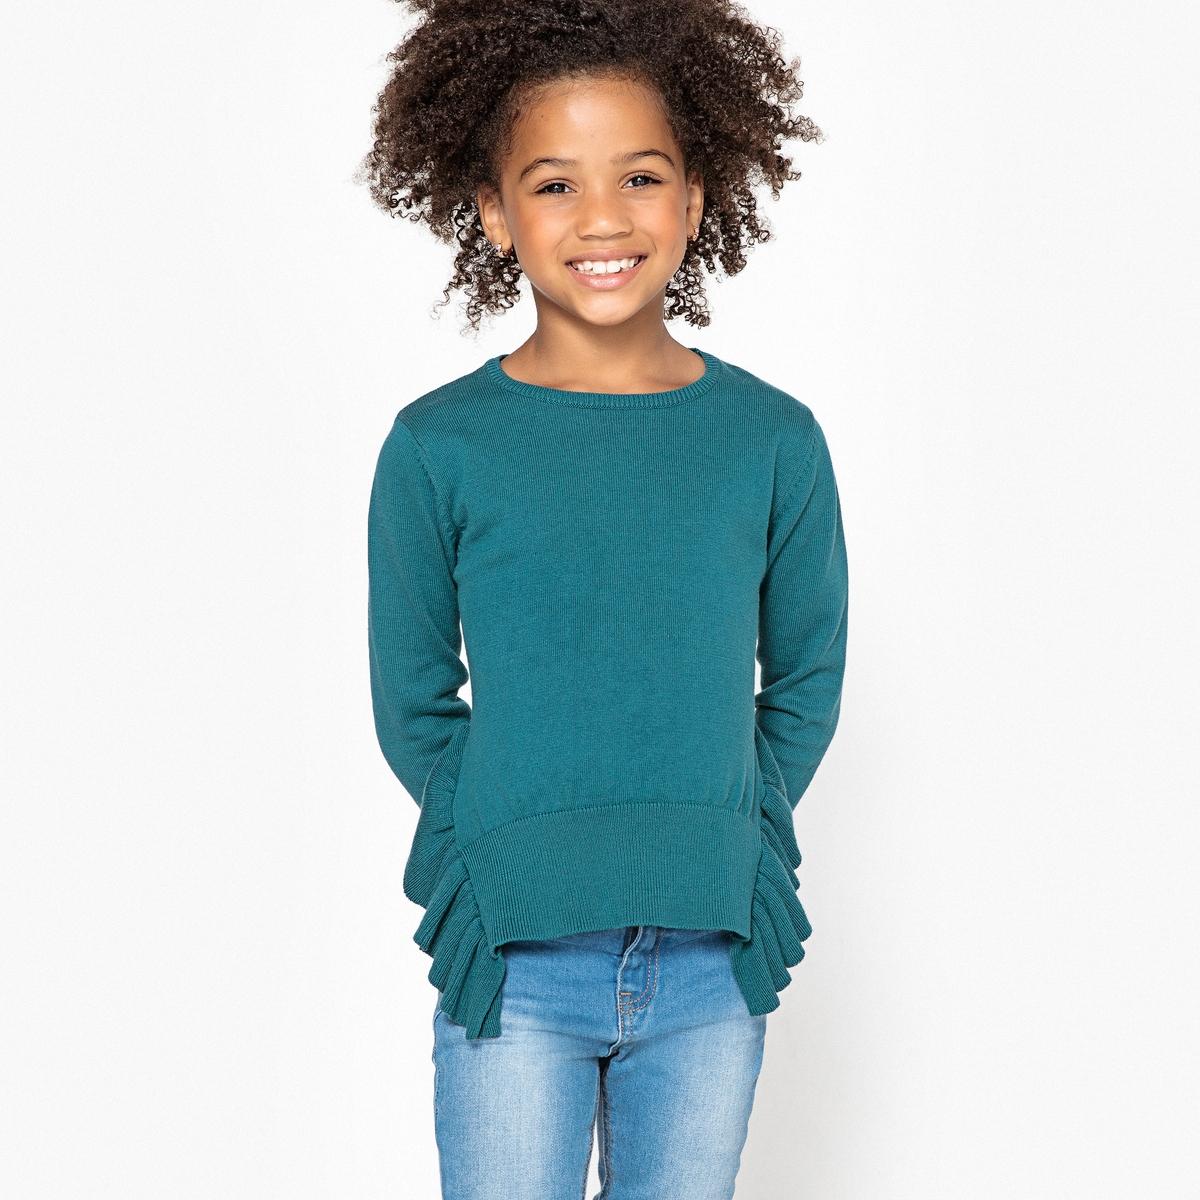 Пуловер La Redoute Из тонкого трикотажа с воланами 5 лет - 108 см синий наматрасник la redoute тонкий толщина см nizami 180 x 200 см синий